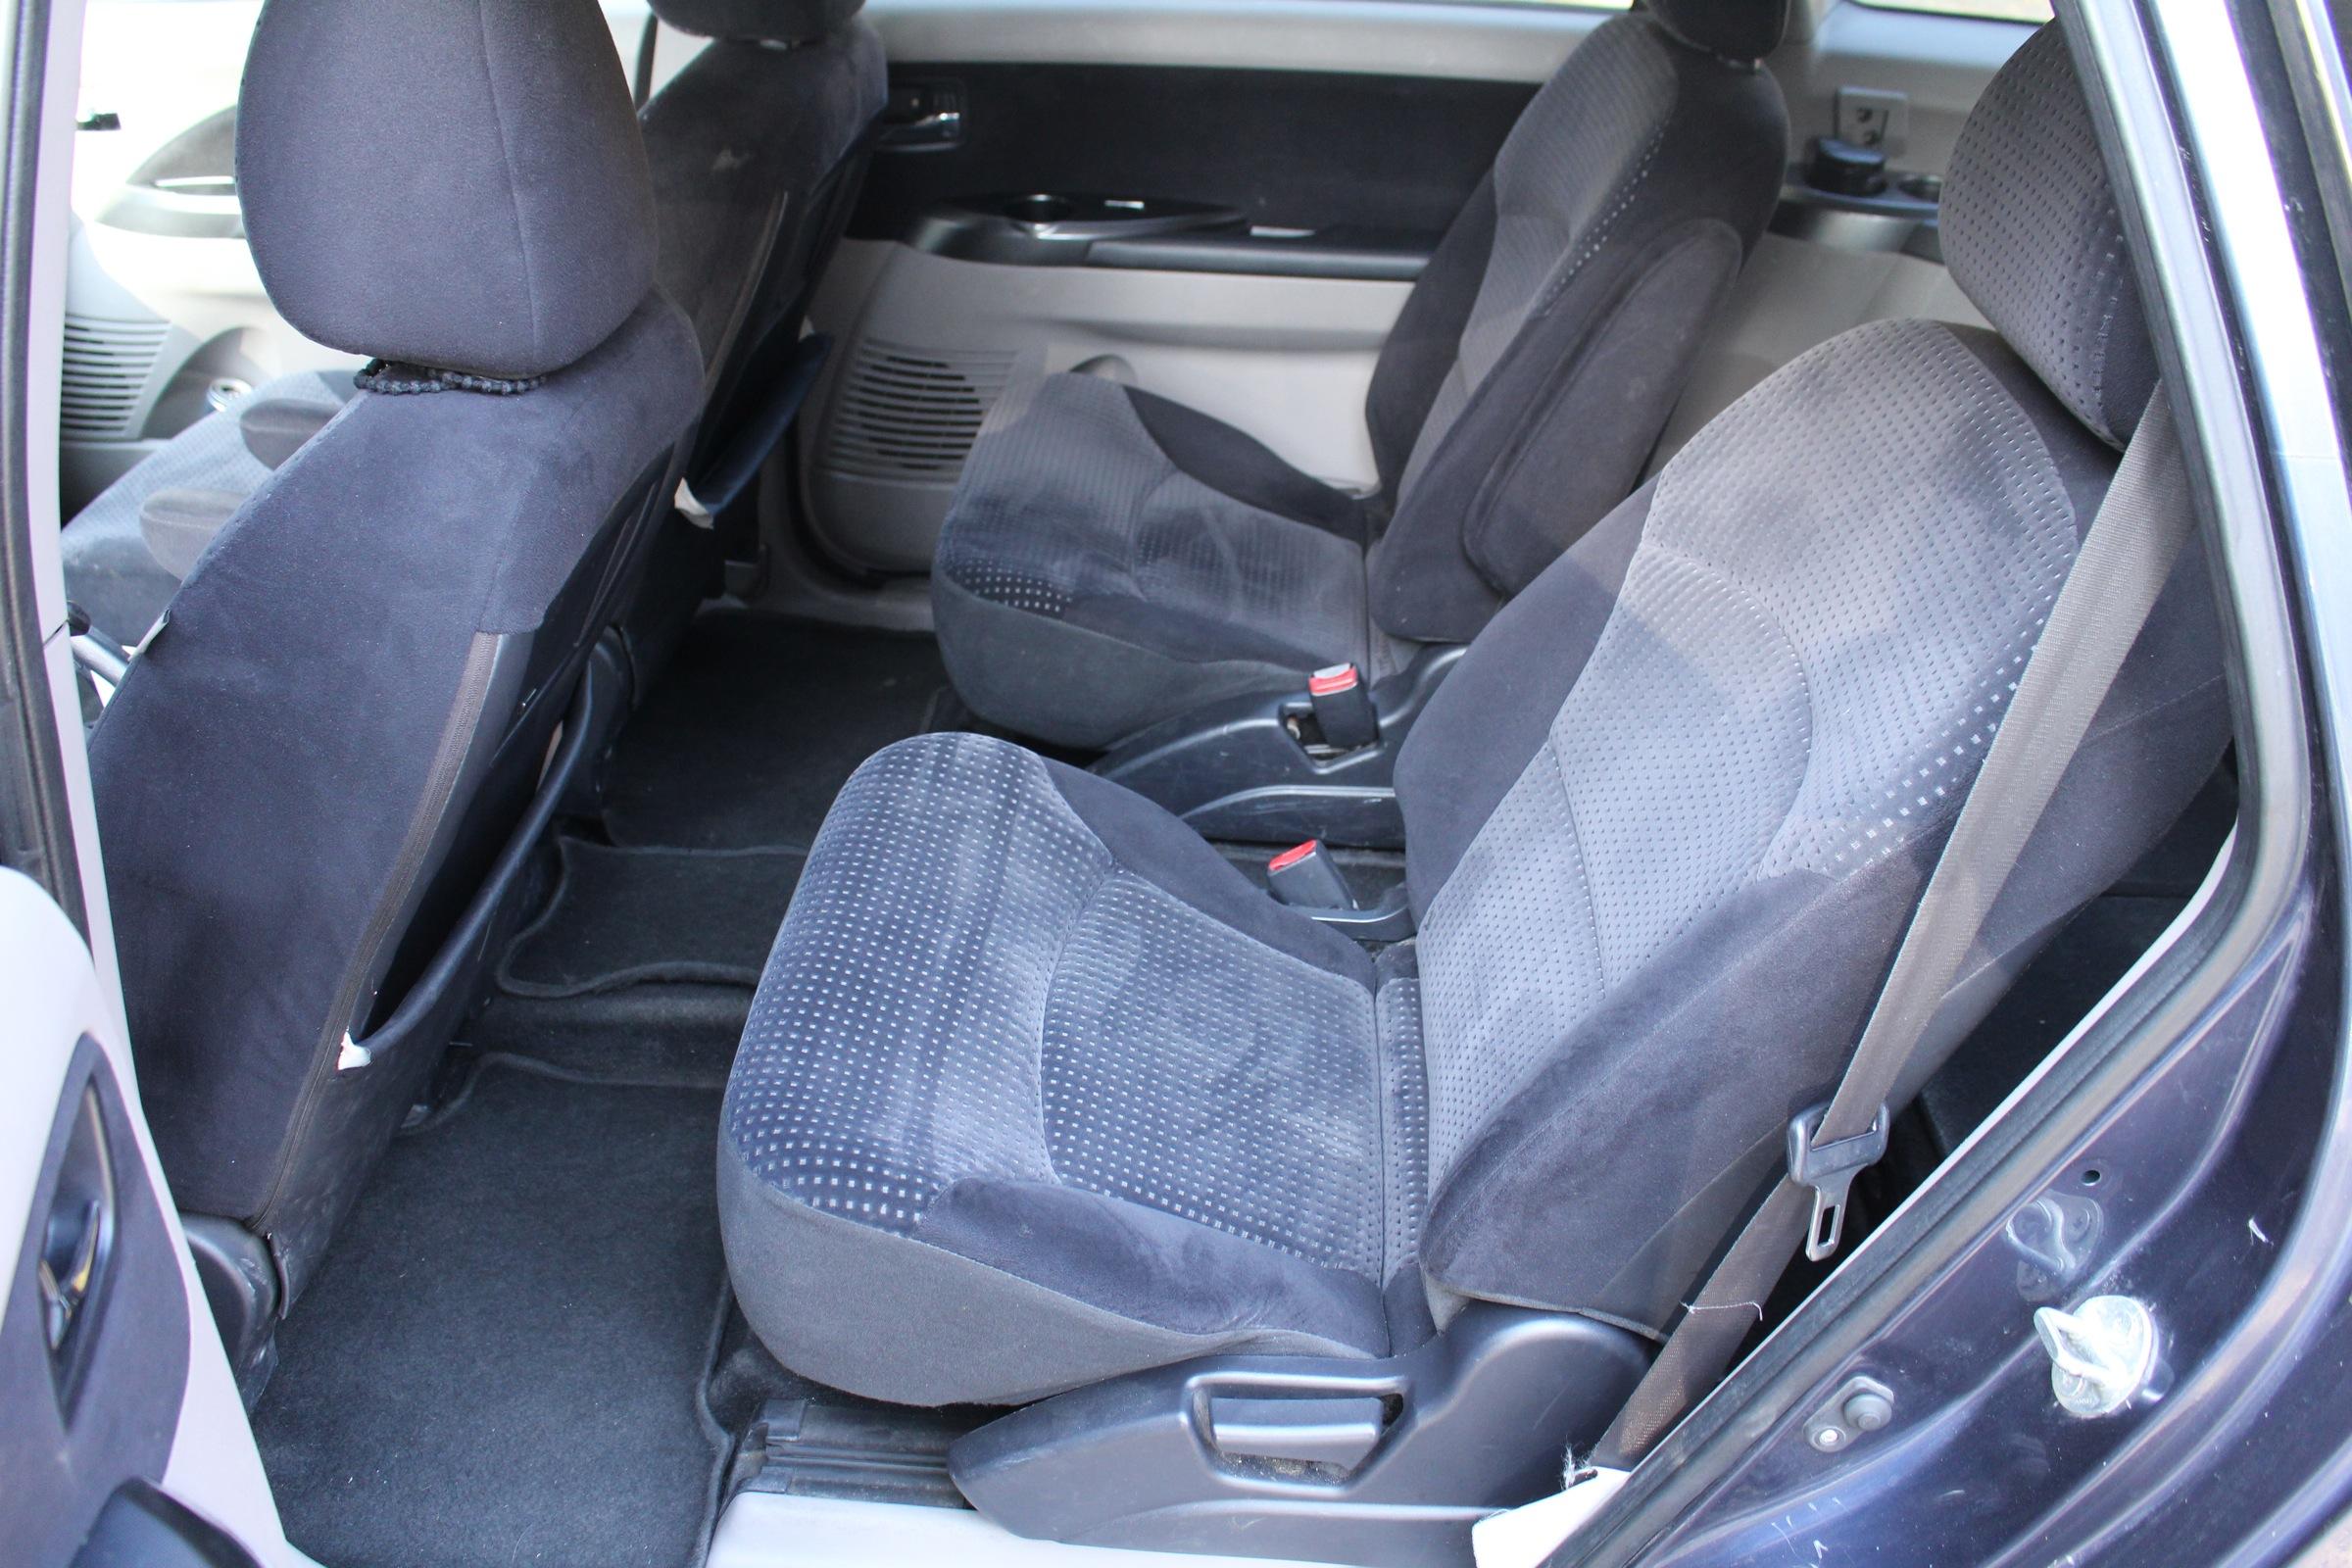 Mitsubishi Grandis 2.0 DI-D opinie